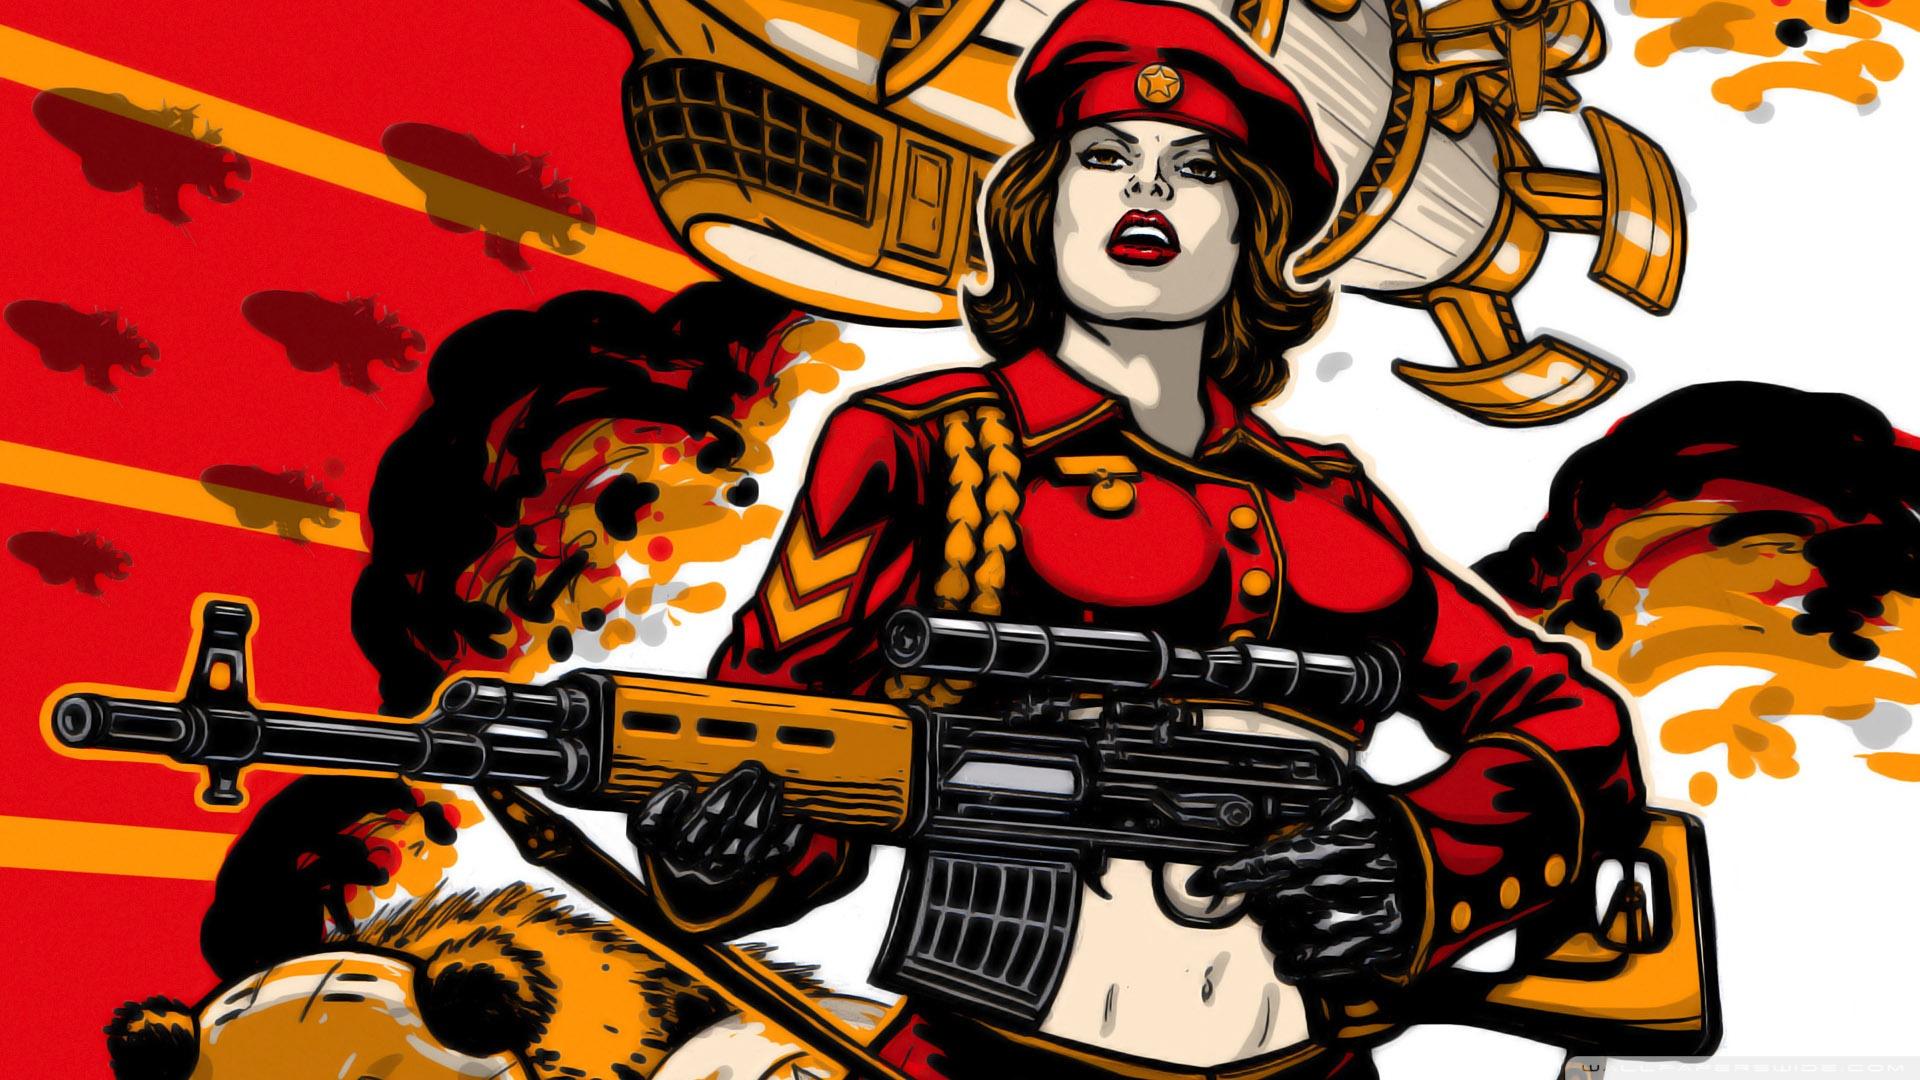 AKSU BRSS - BOLT AIRSOFT Ra3_soviet_army_girl-wallpaper-1920x1080